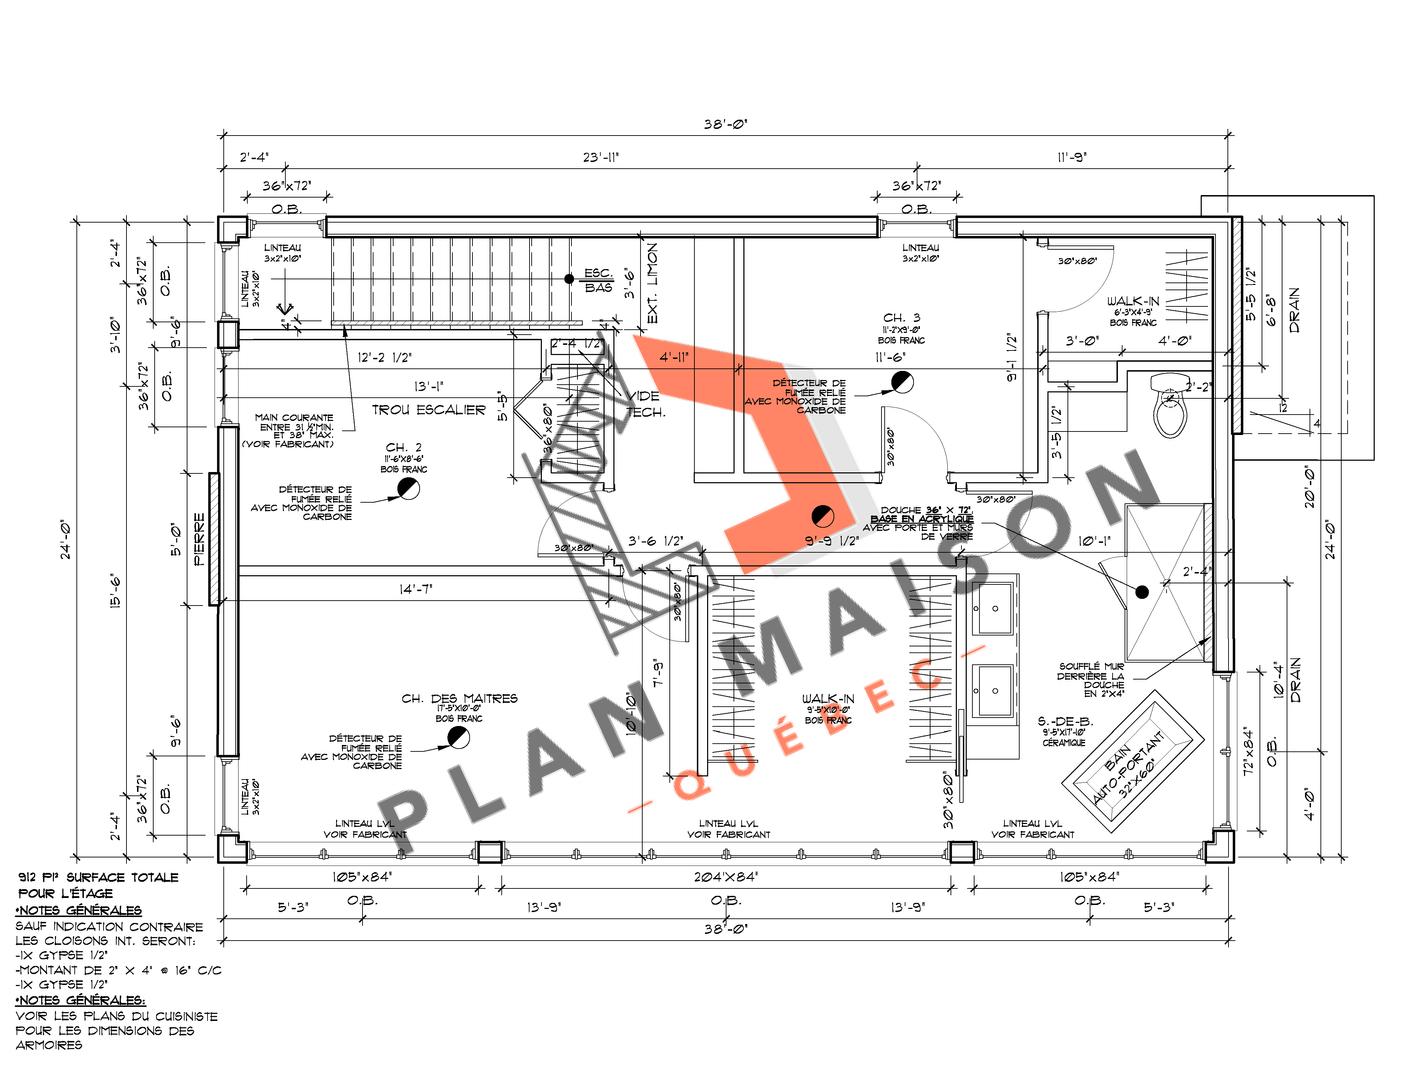 construire maison plan 7